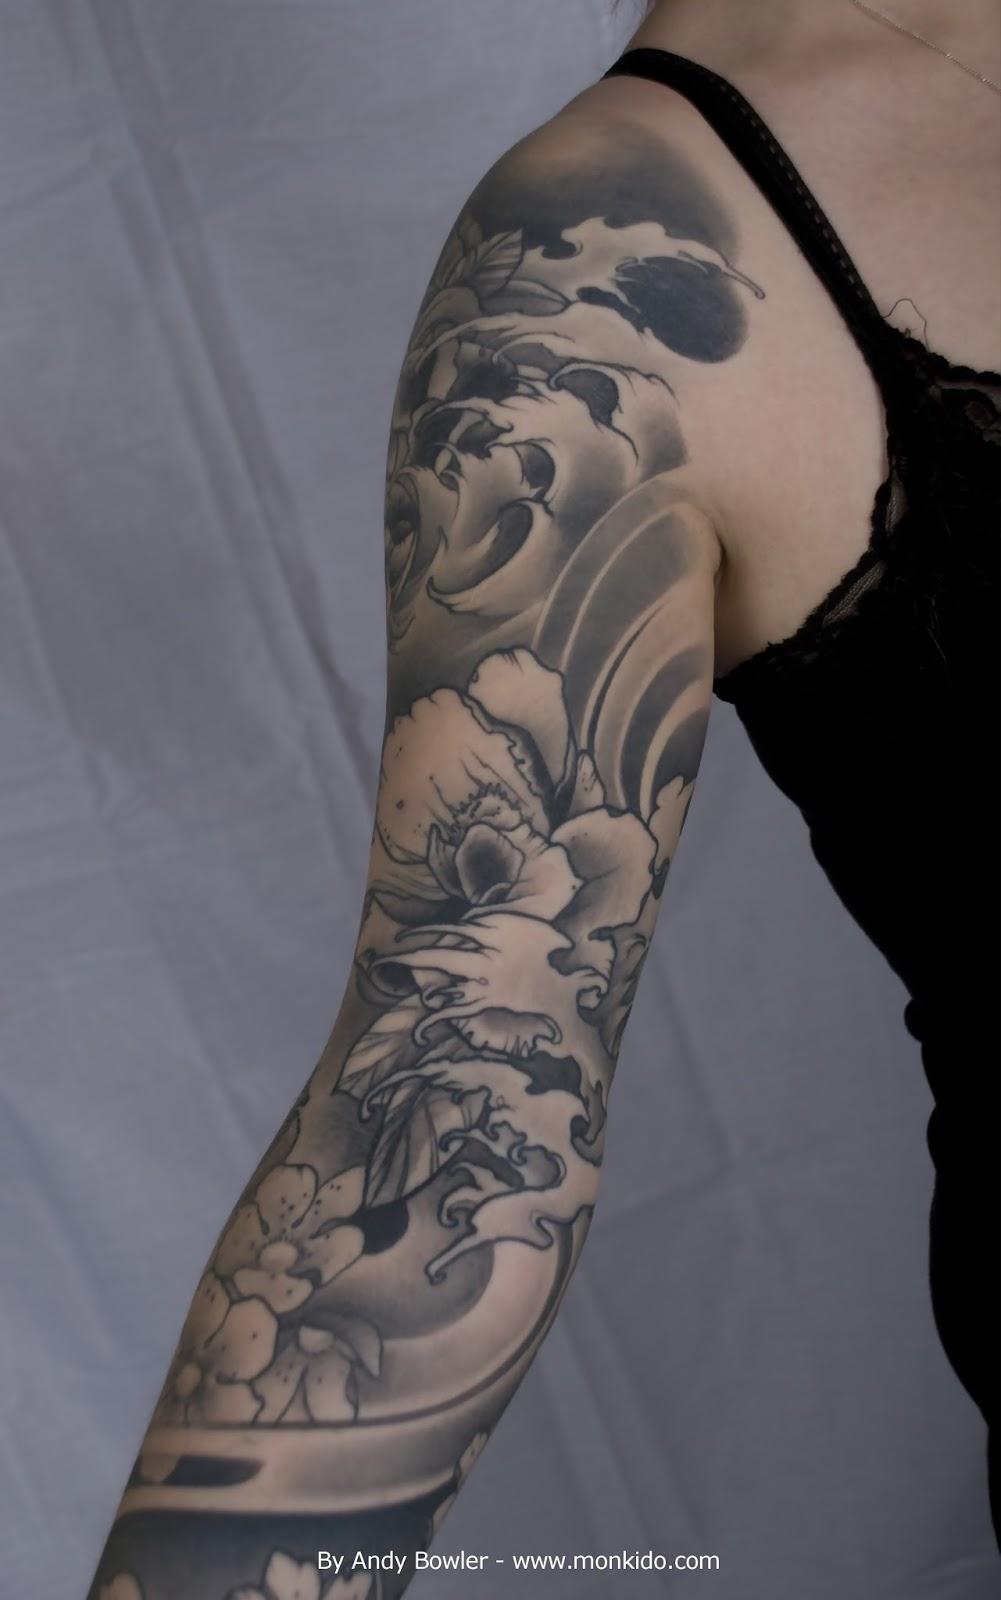 Monki Do Tattoo Studio Custom Japanese Sleeve by Andy